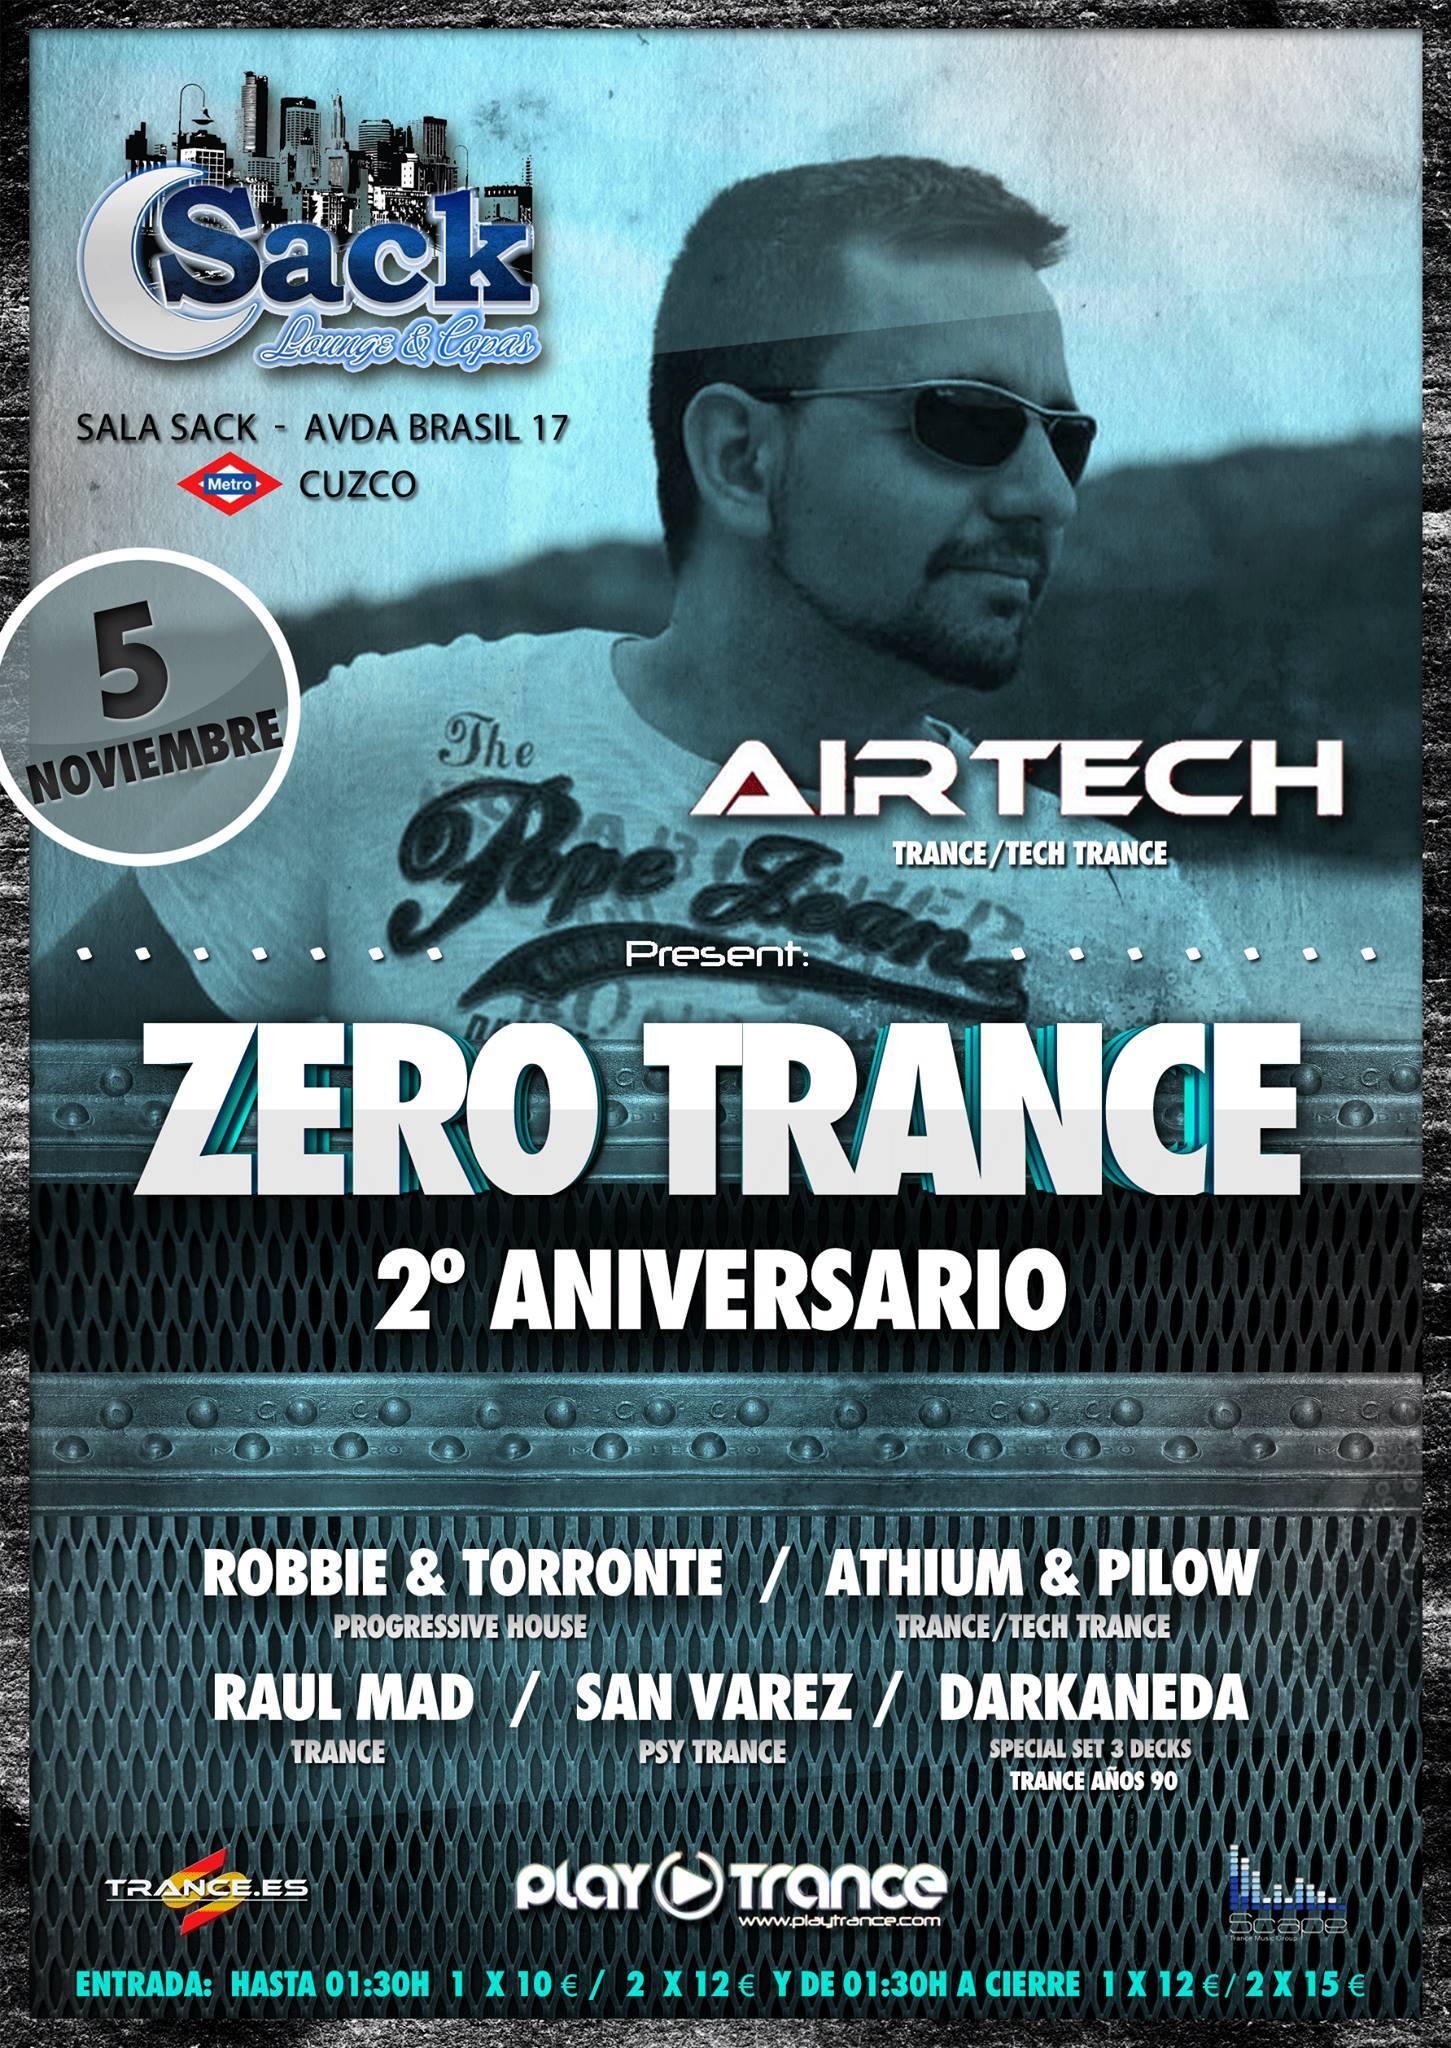 Trance 100% nacional en la fiesta Zero Trance 150 programas